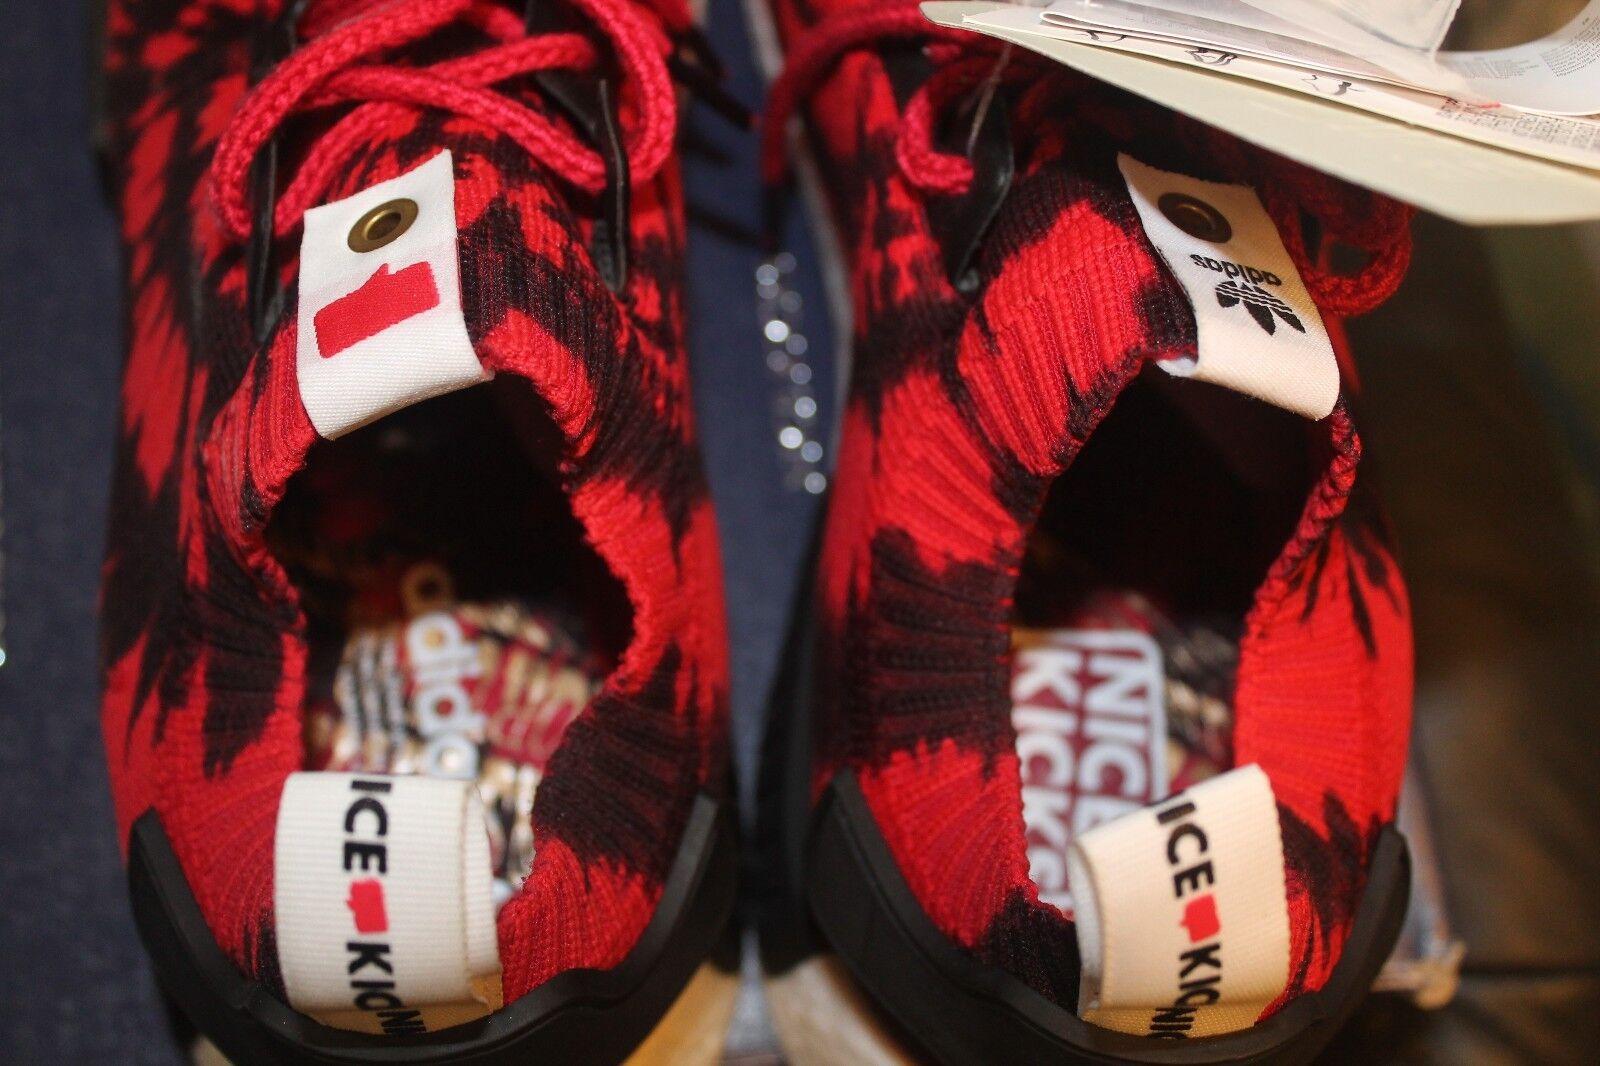 Adidas x Nice Kicks NMD NMD NMD R1 PK Spiderman US 12 DS AQ4791 i ii iii iv v vi 3764ef